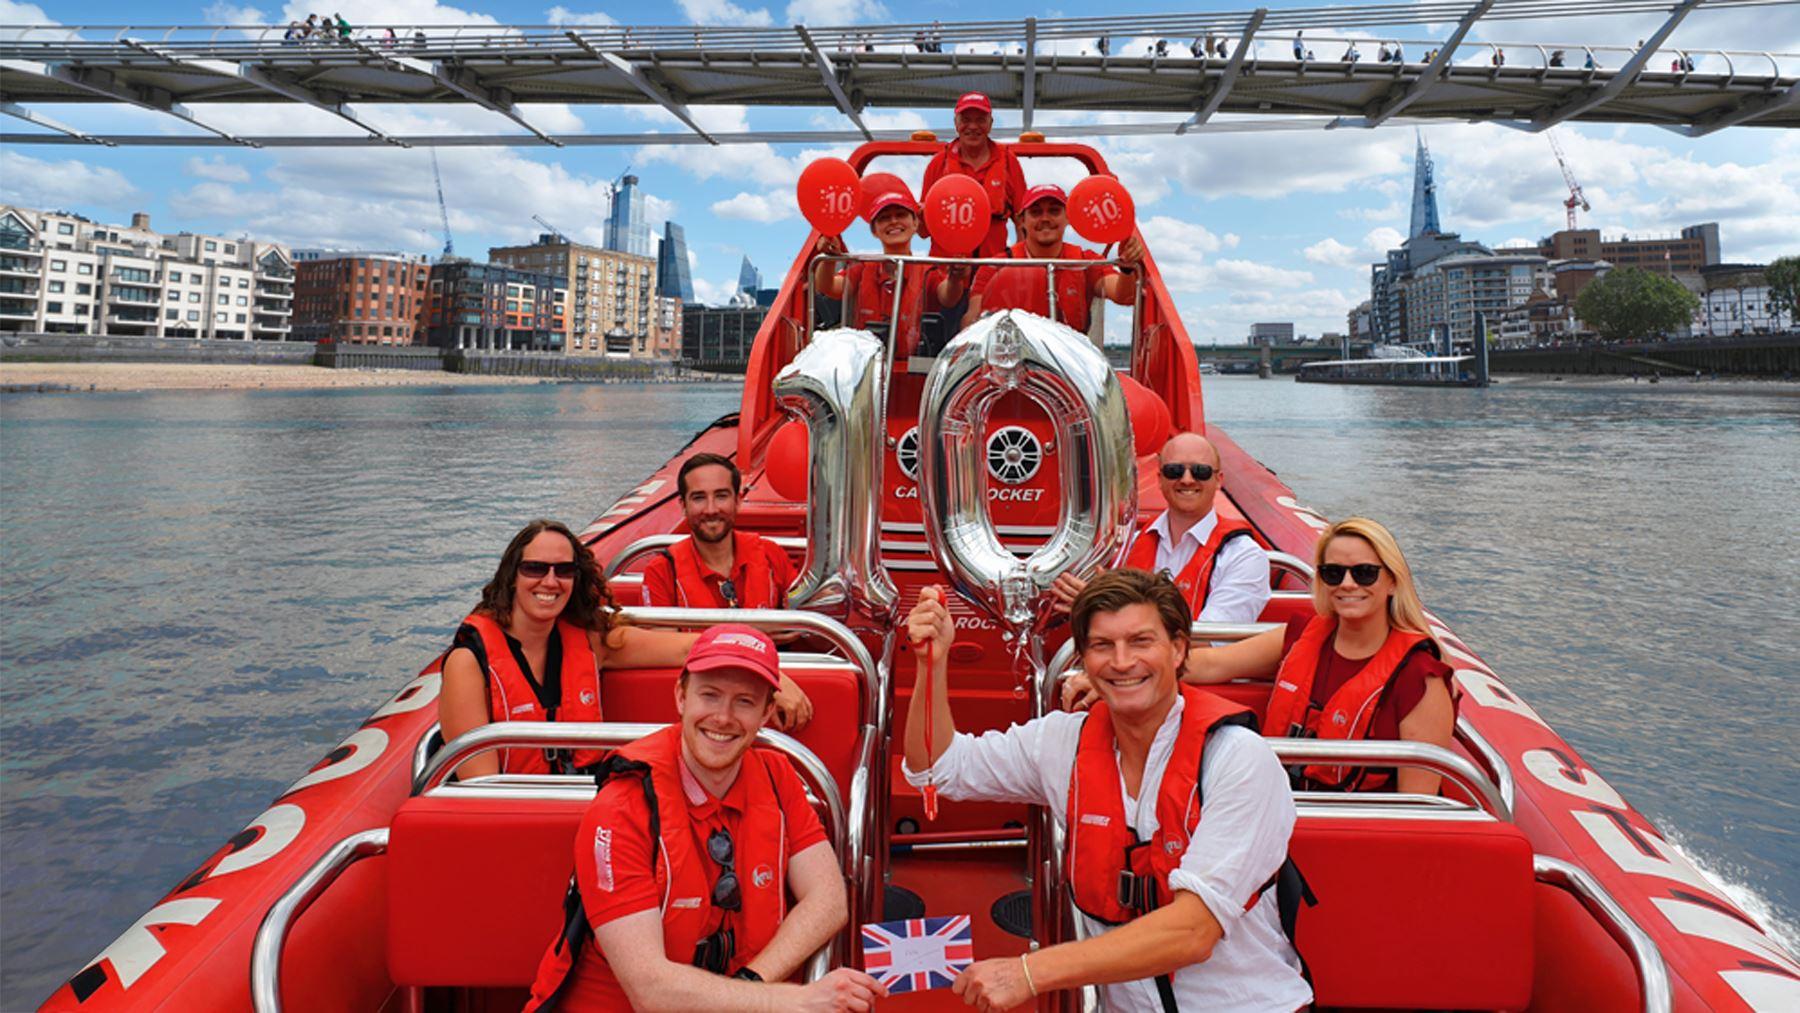 Celebrations for London Speedboat Sightseeing!